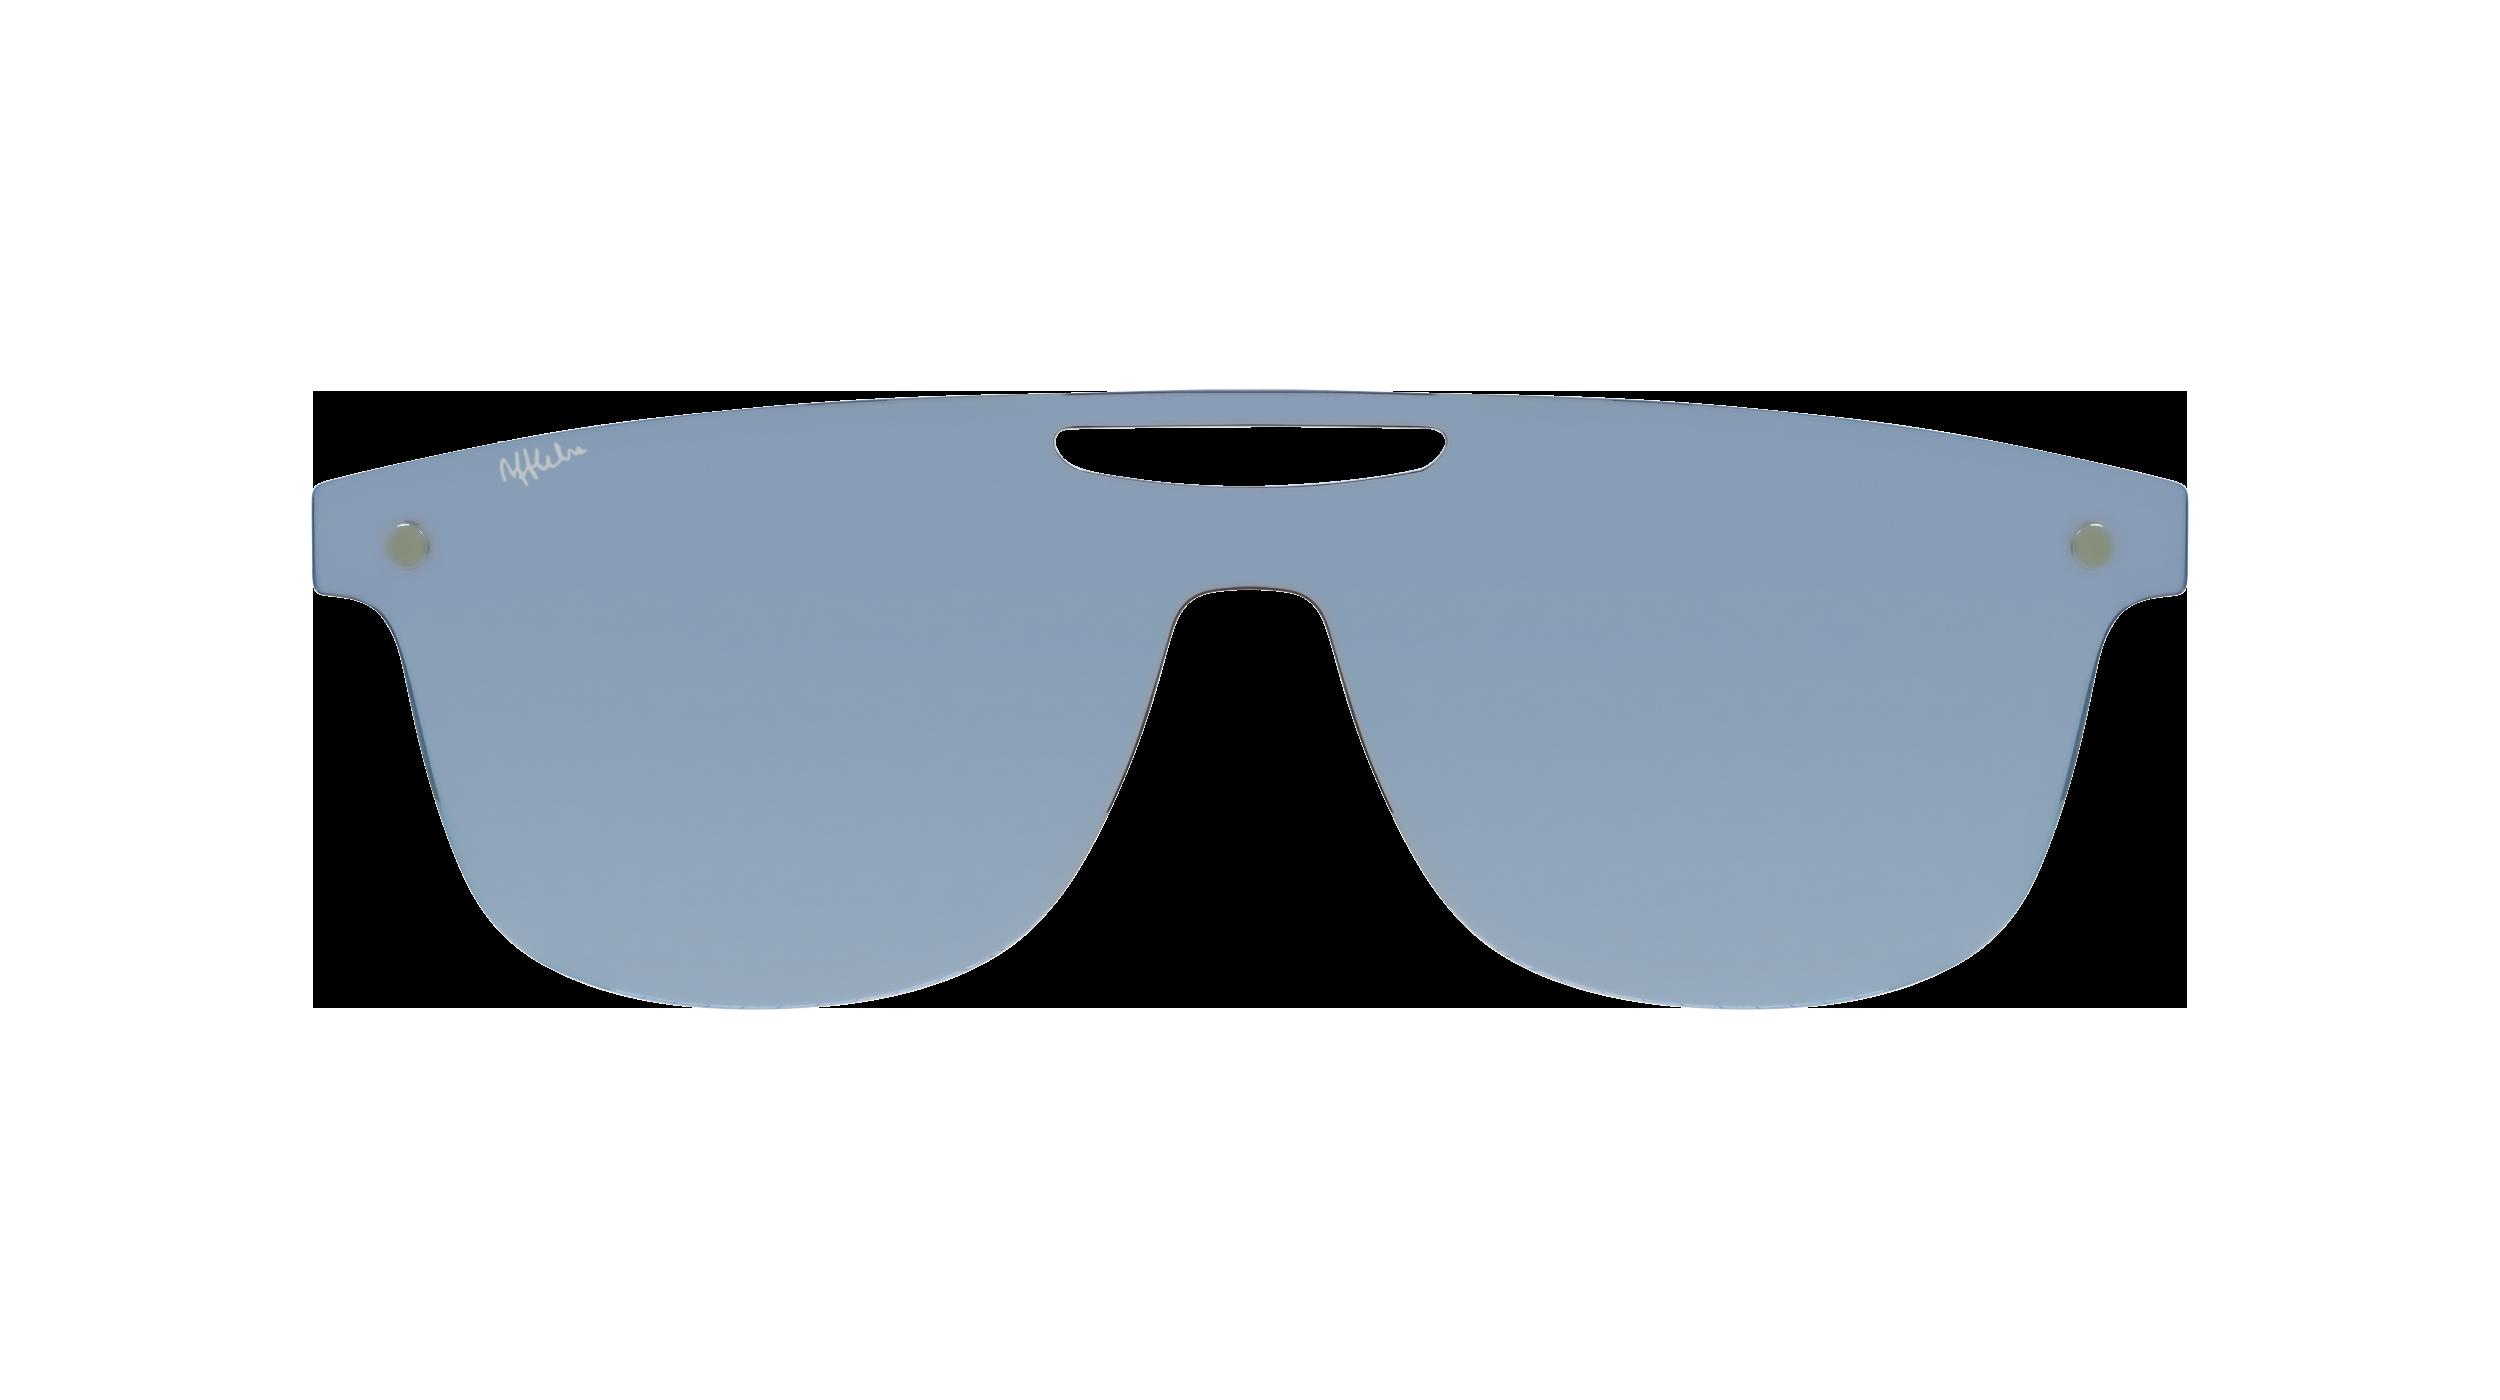 afflelou/france/products/smart_clip/clips_glasses/07630036452882.png